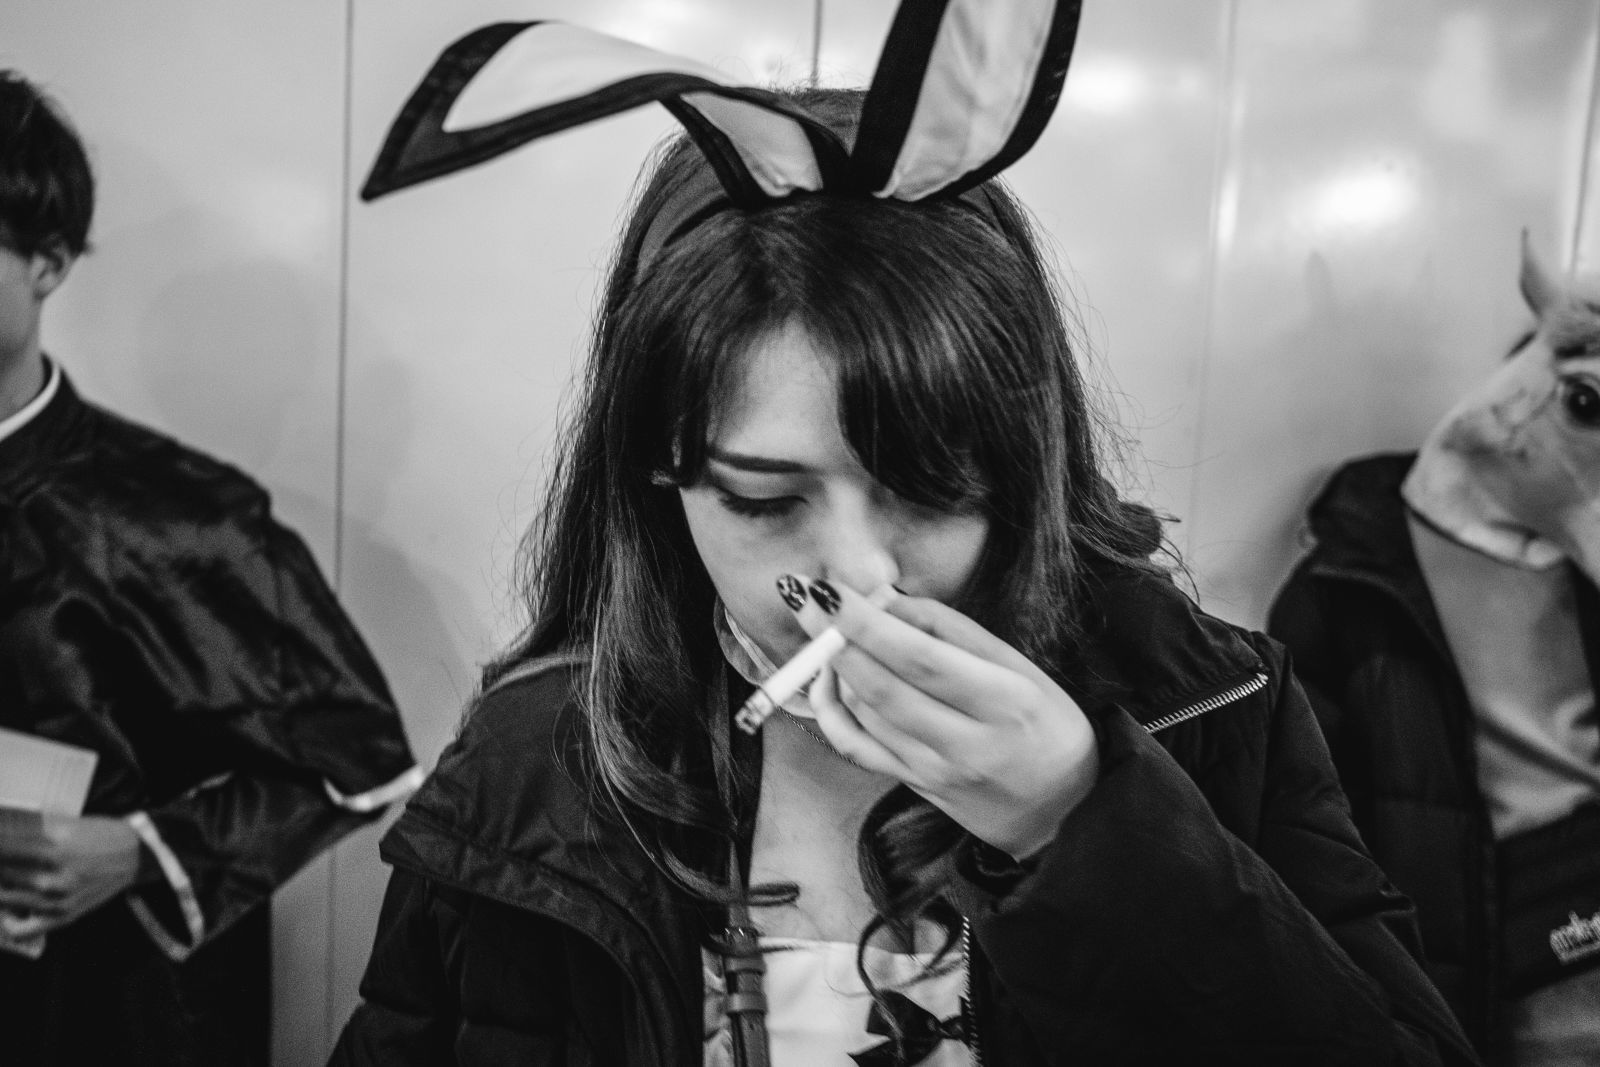 Having a smoke.